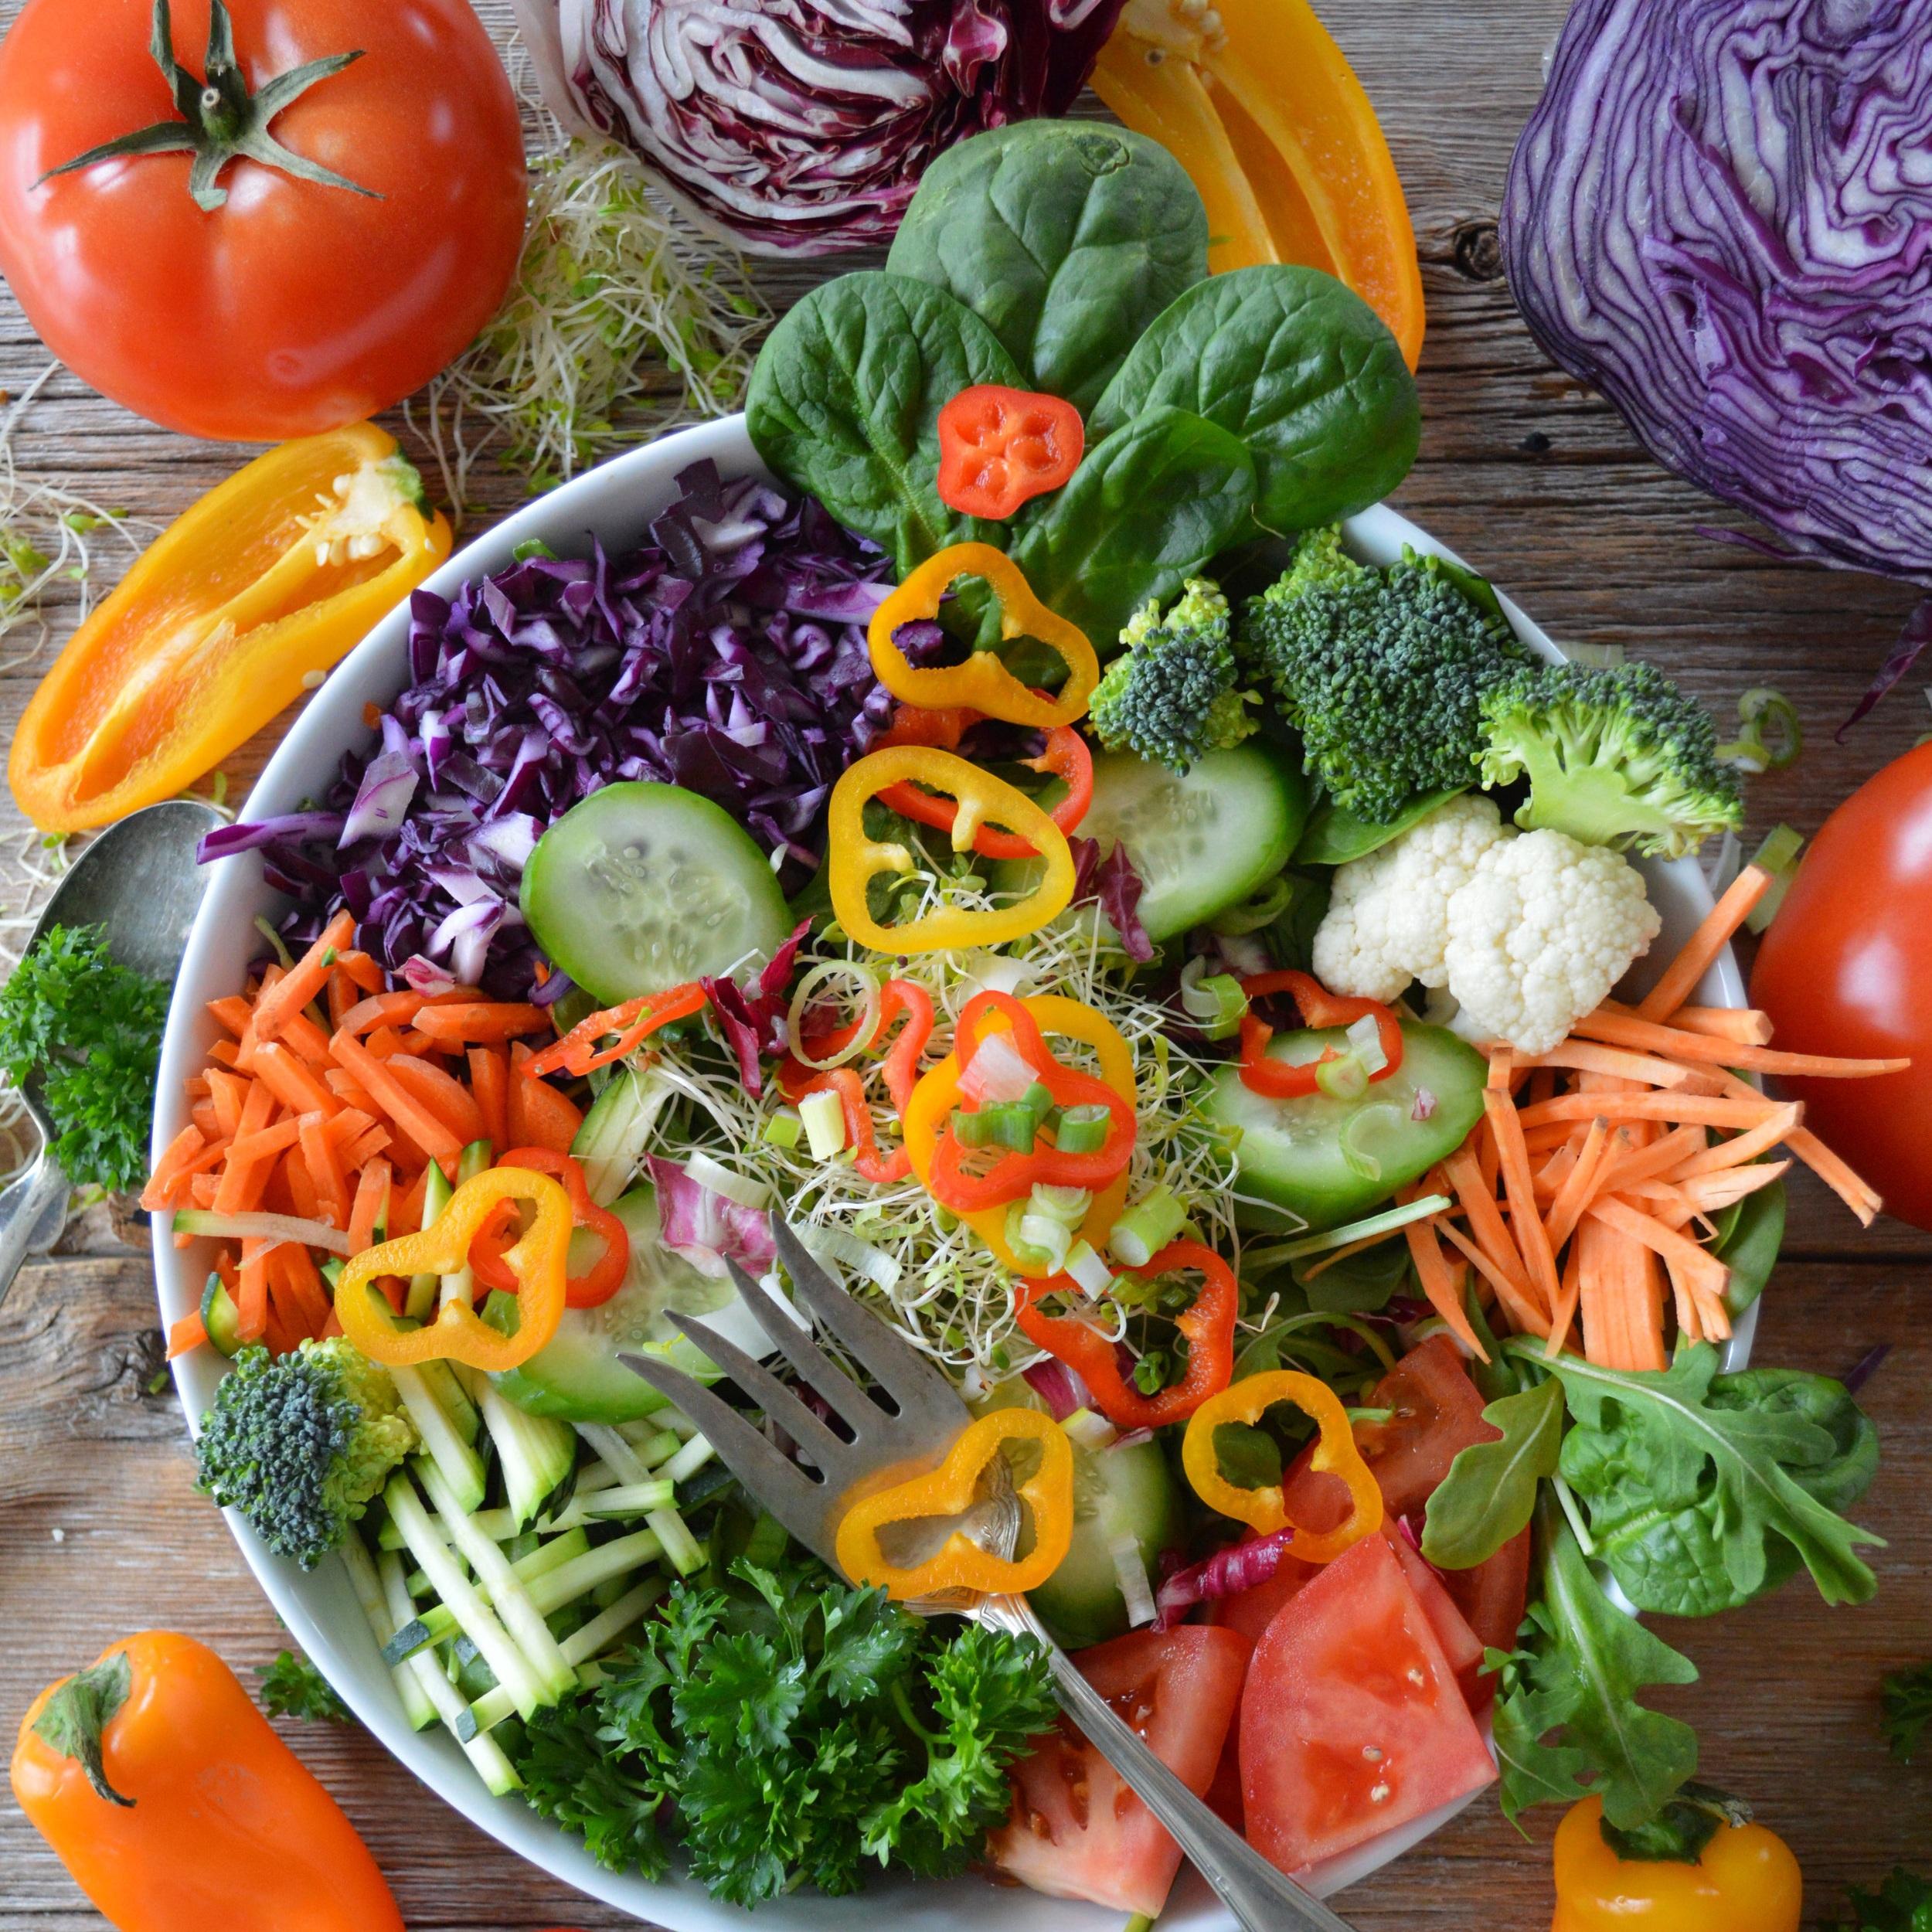 passionate-home-chef-programs